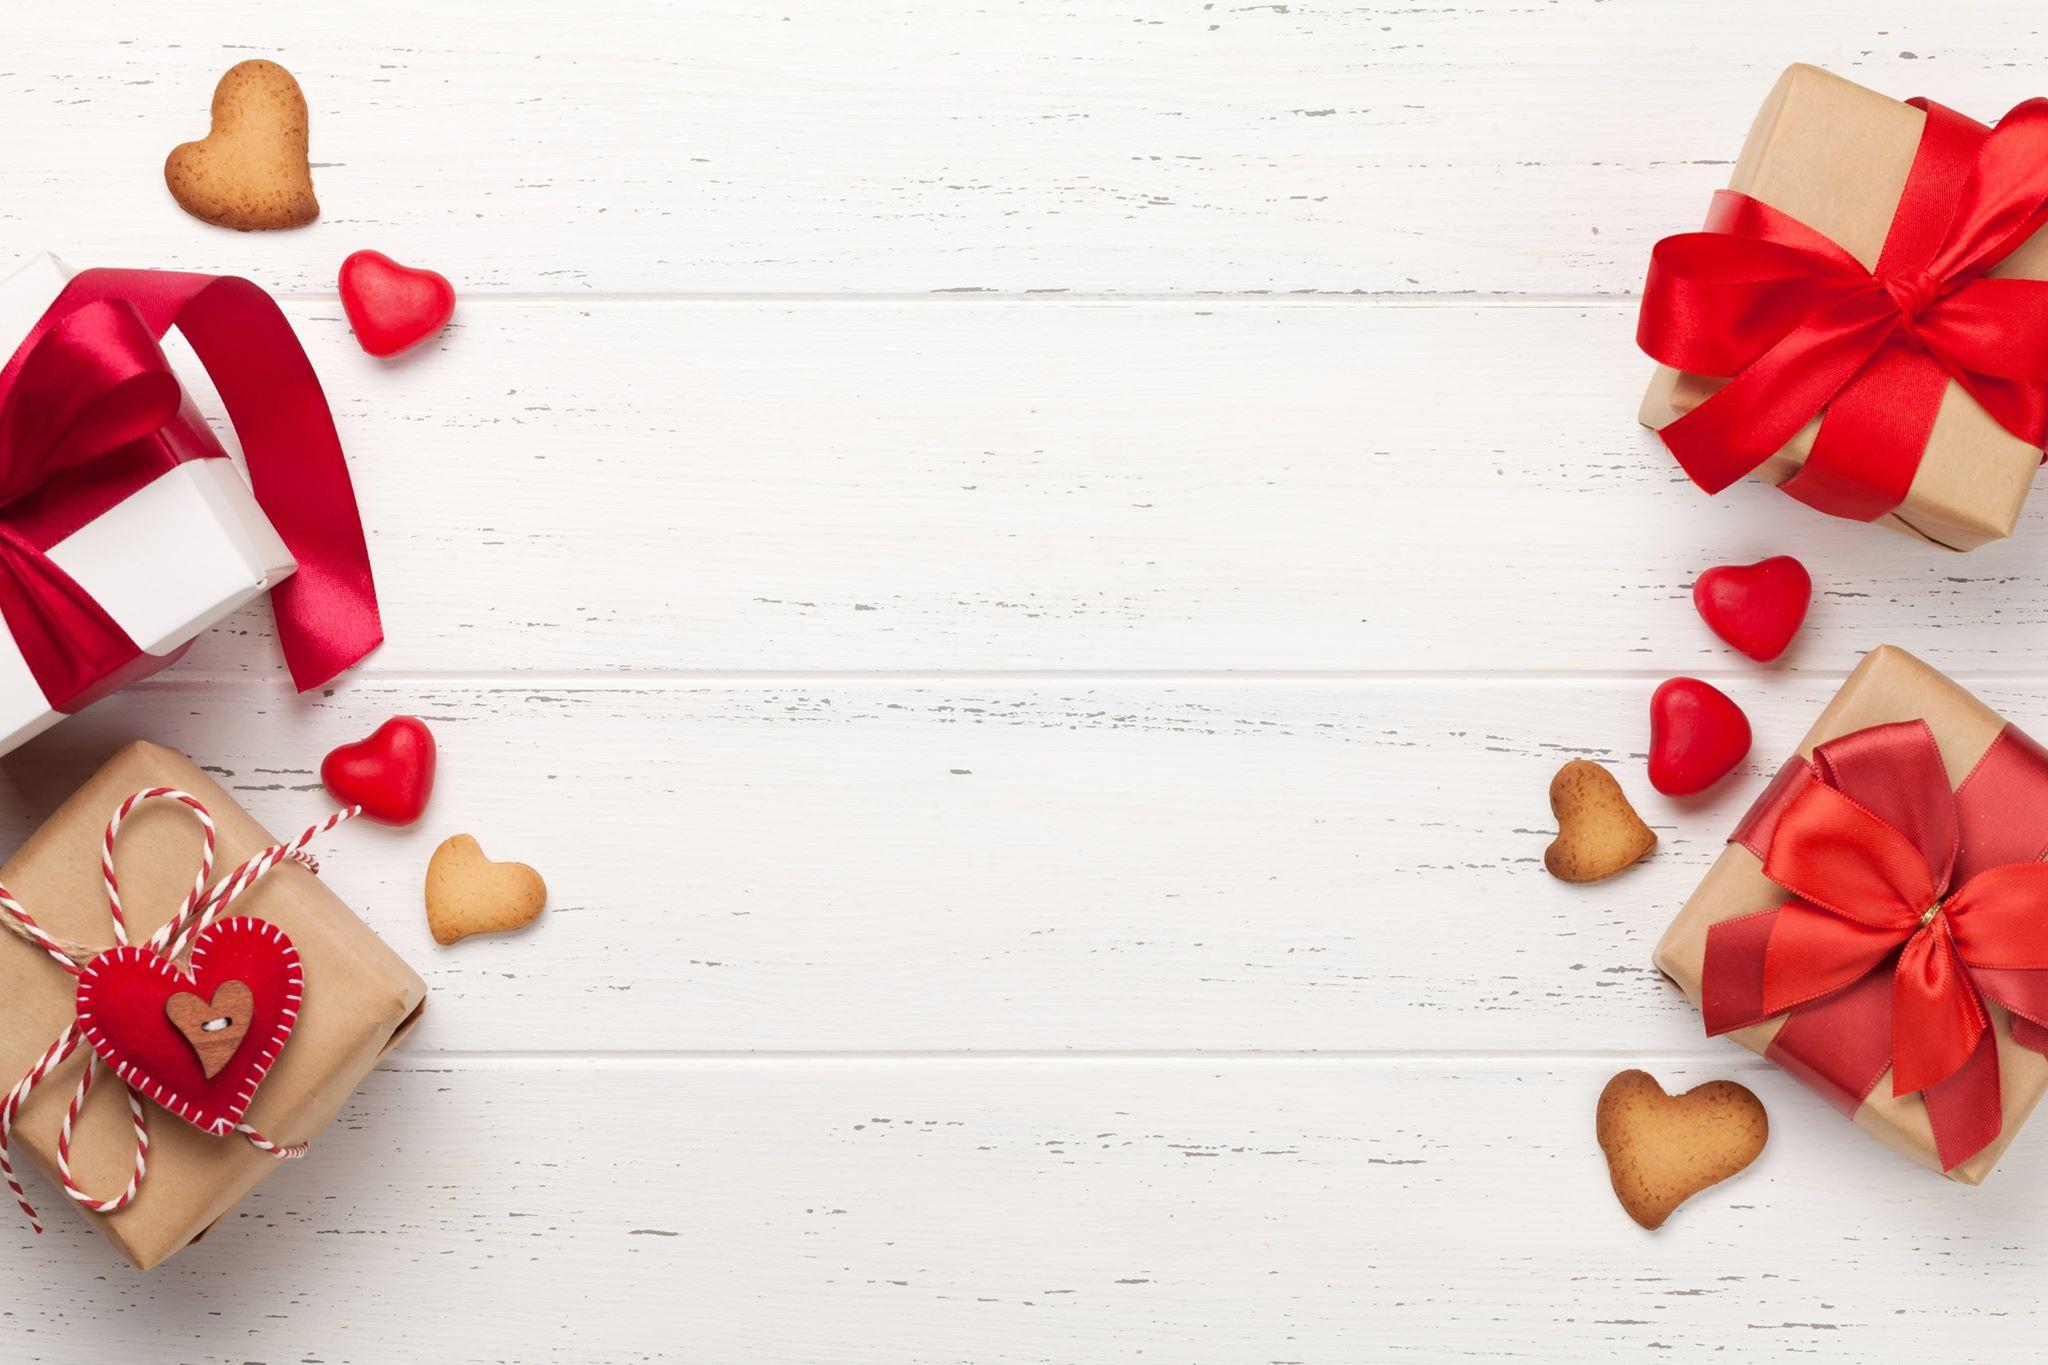 Valentines day images 21 صور عيد الحب